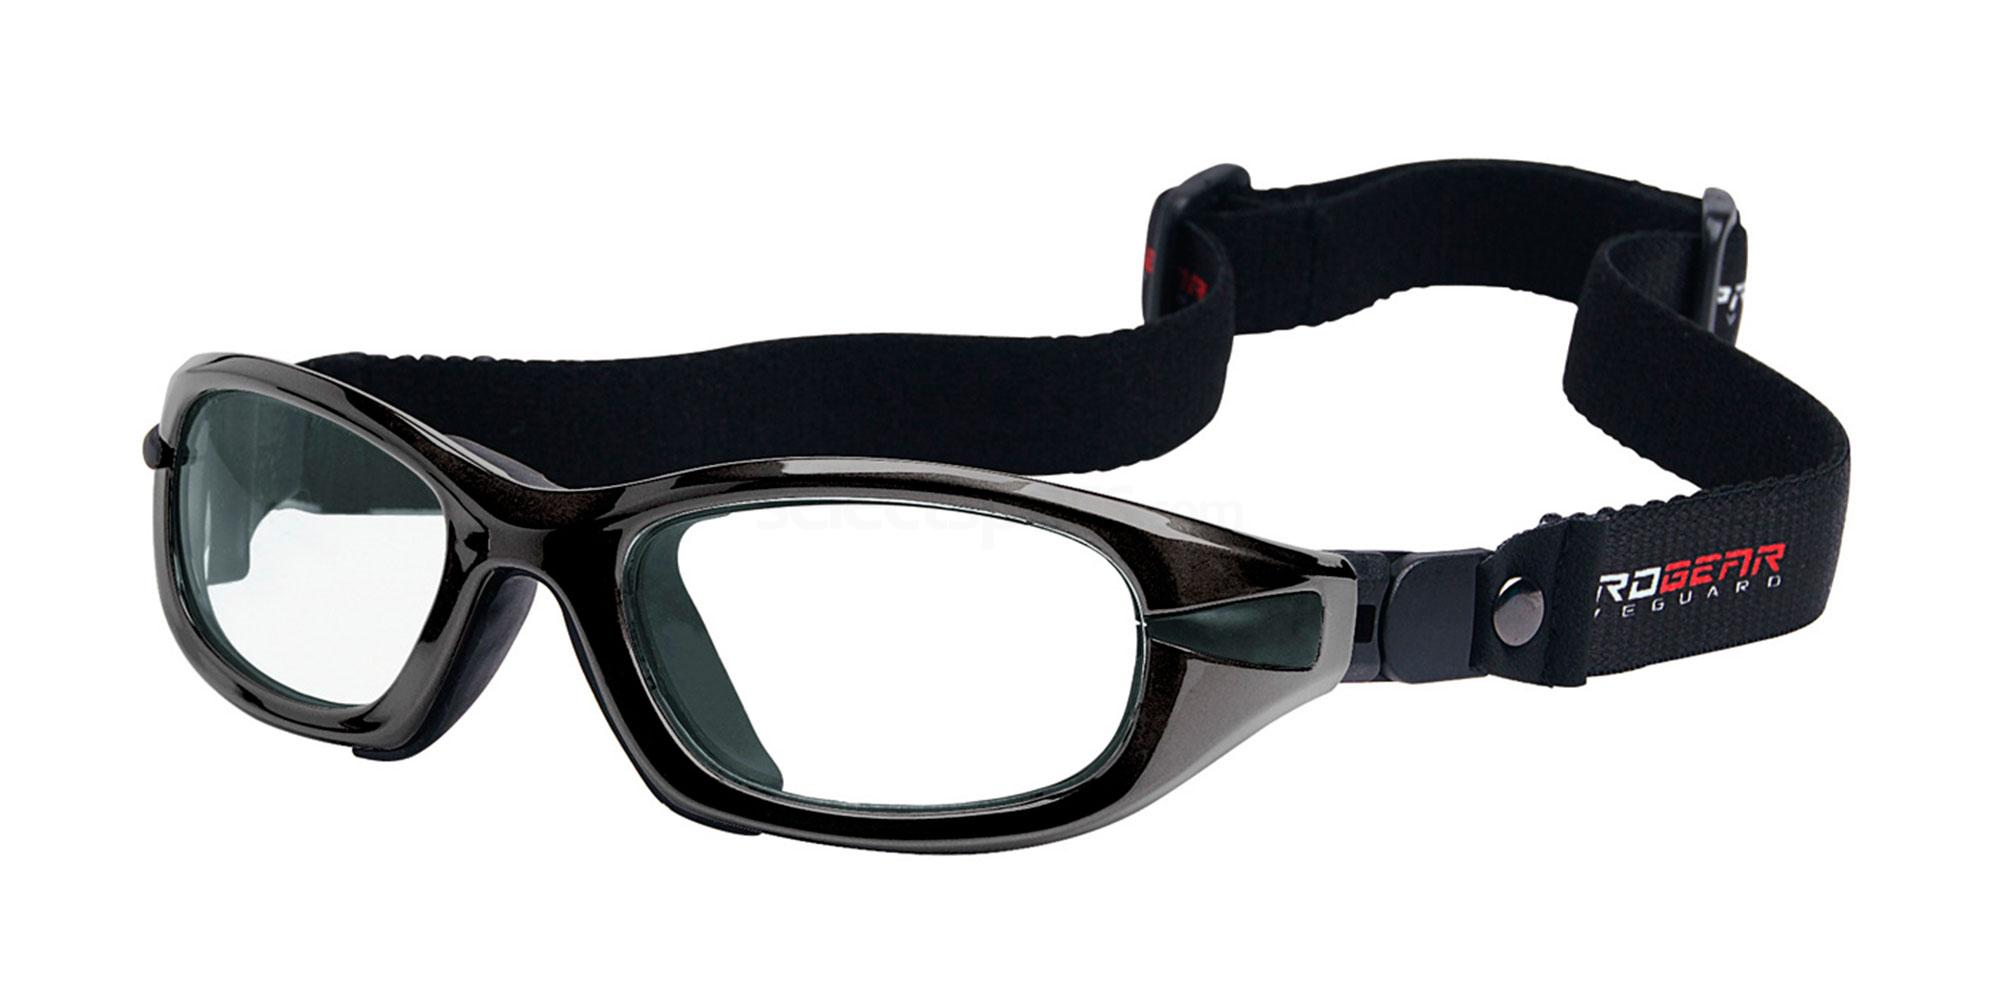 Black Progear EG-M 1021 Accessories, Sports Eyewear